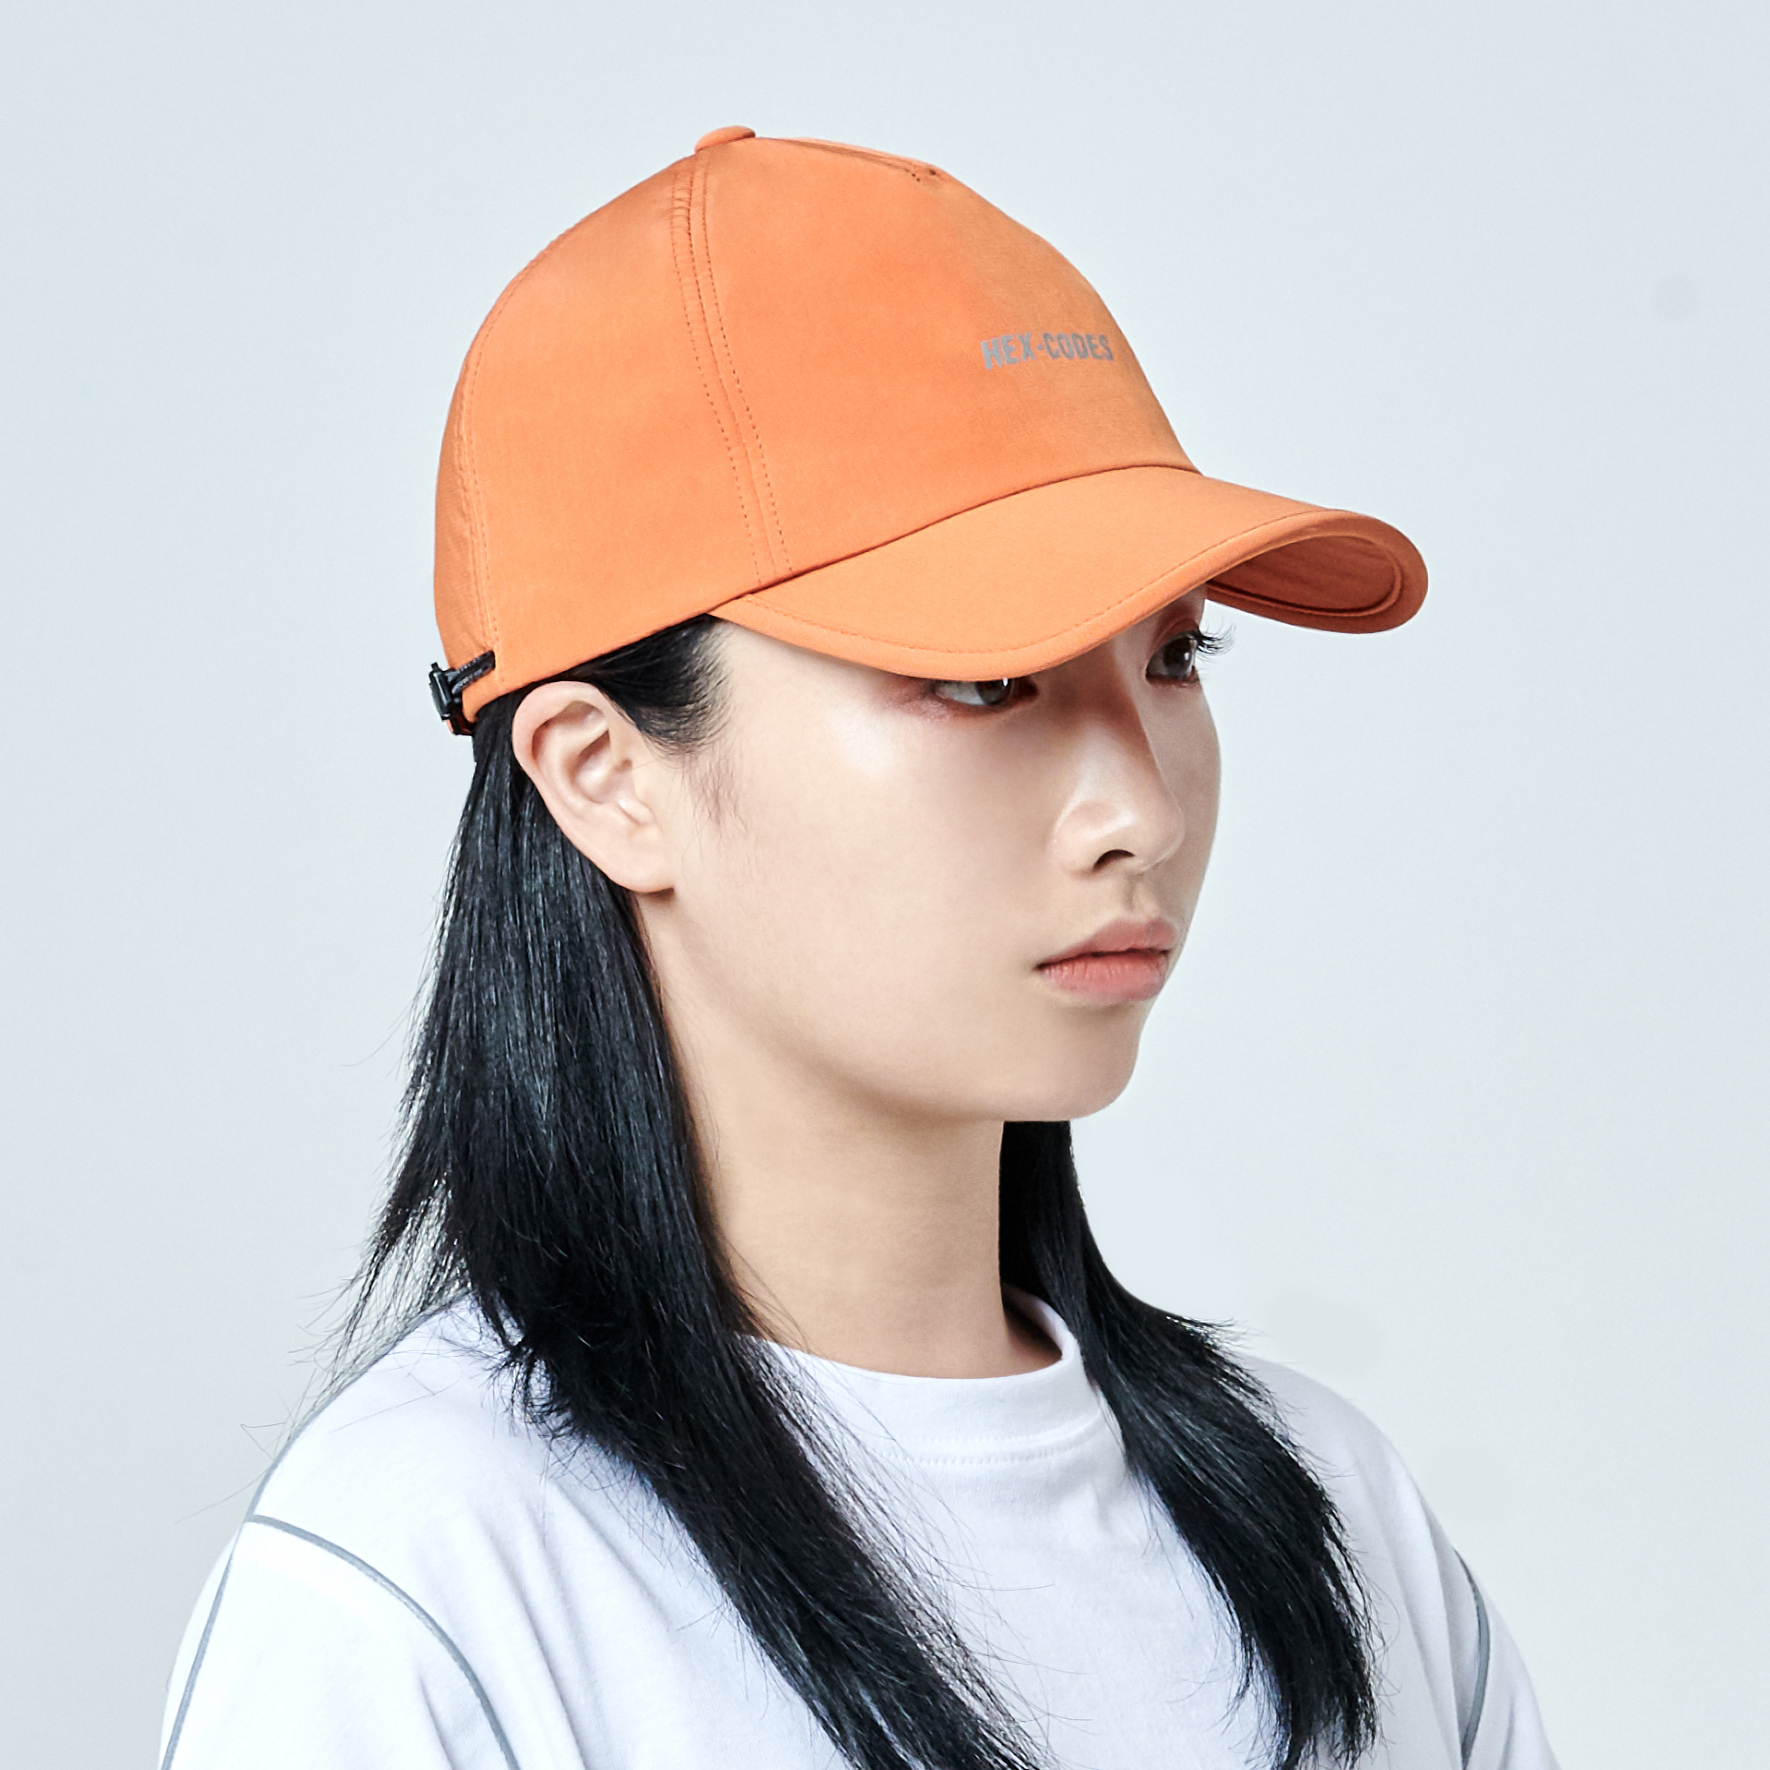 H04 펜타곤 프랙티컬 볼캡 모자 PENTAGON PRACTICAL CAP WITH 3M PRINTING ORANGE